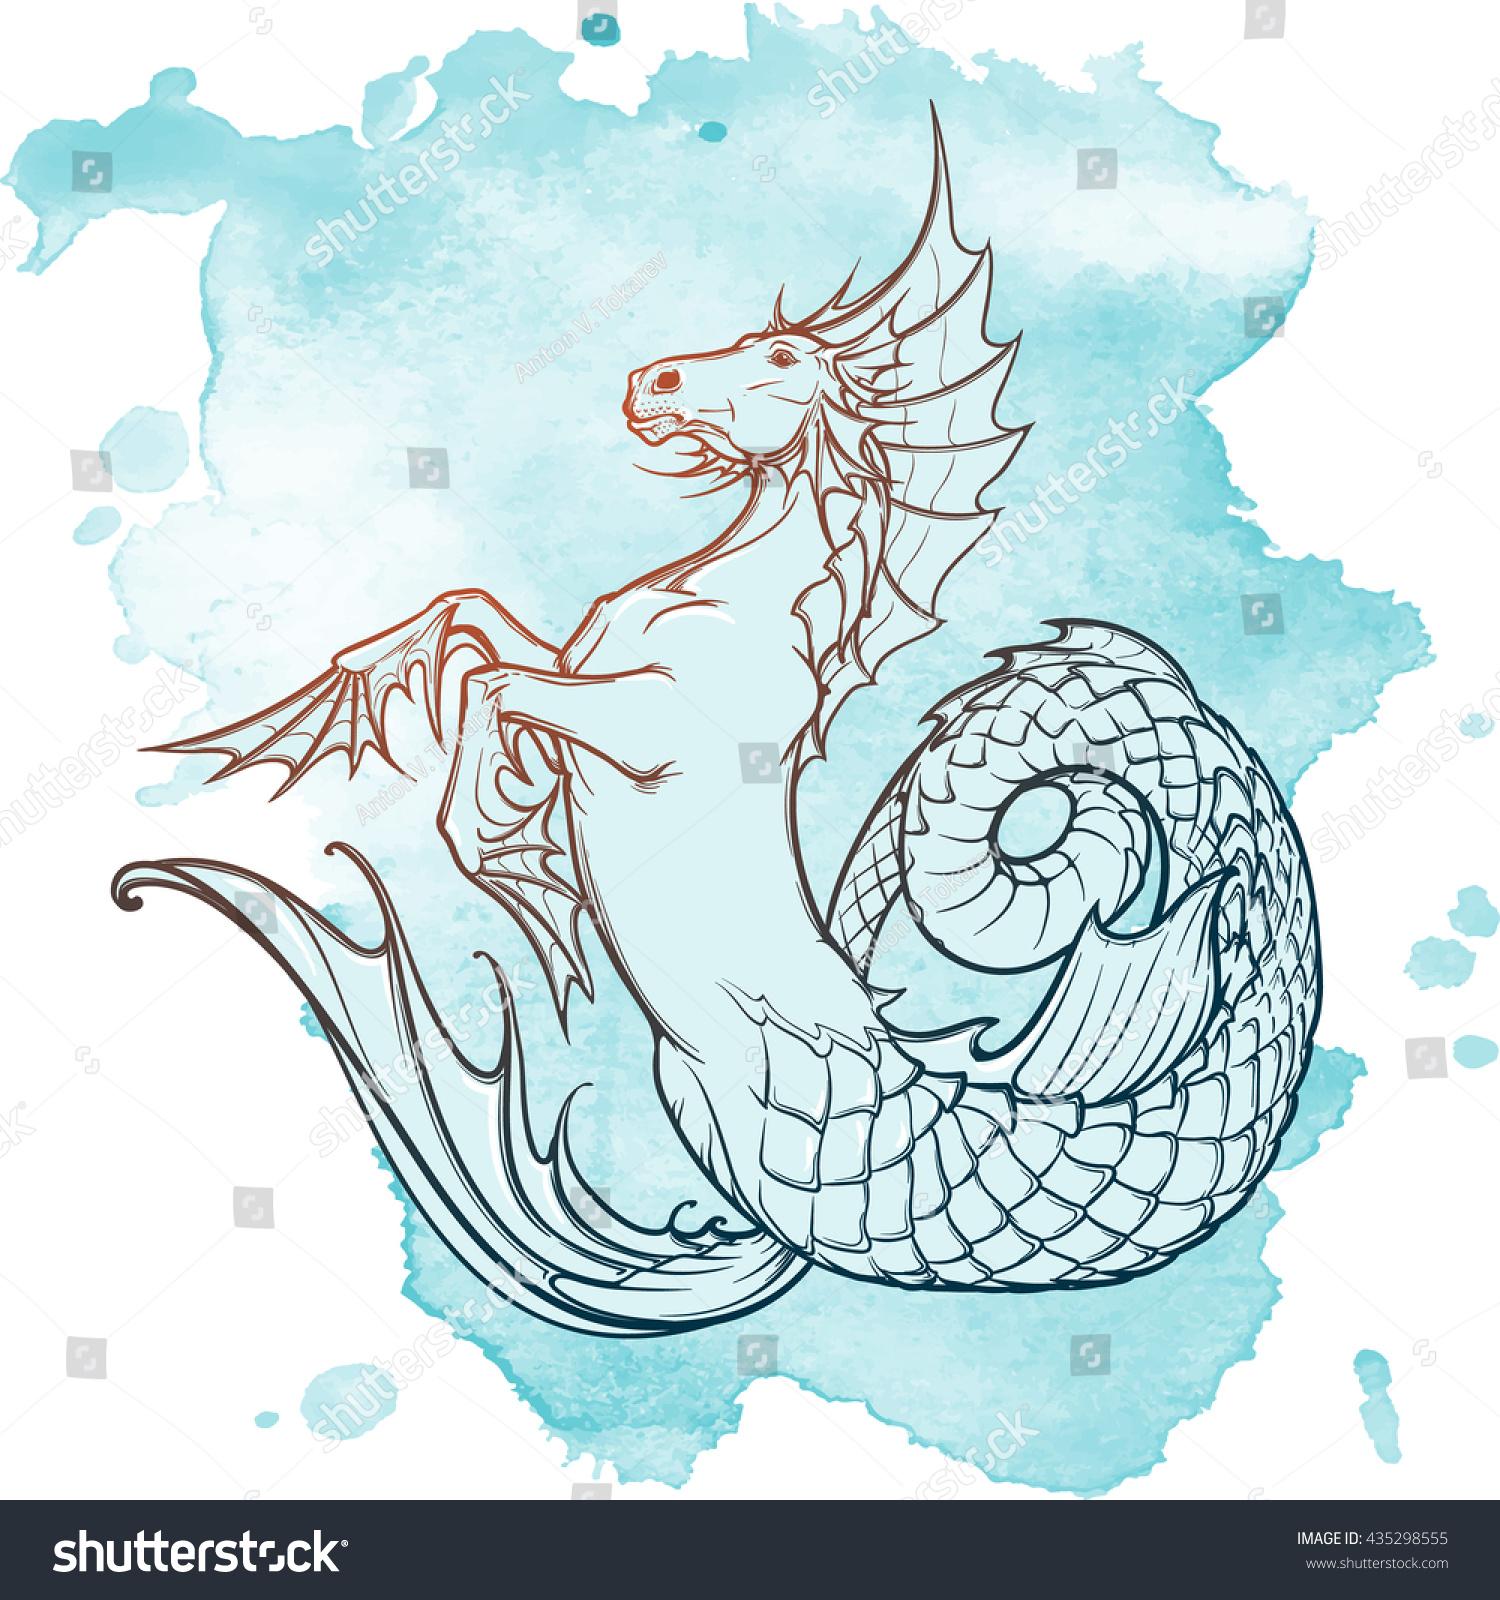 Hippocampus Greek Mythological Creature. Kelpie Scottish Fairy Tale Water Horse. Vintage Tattoo ...